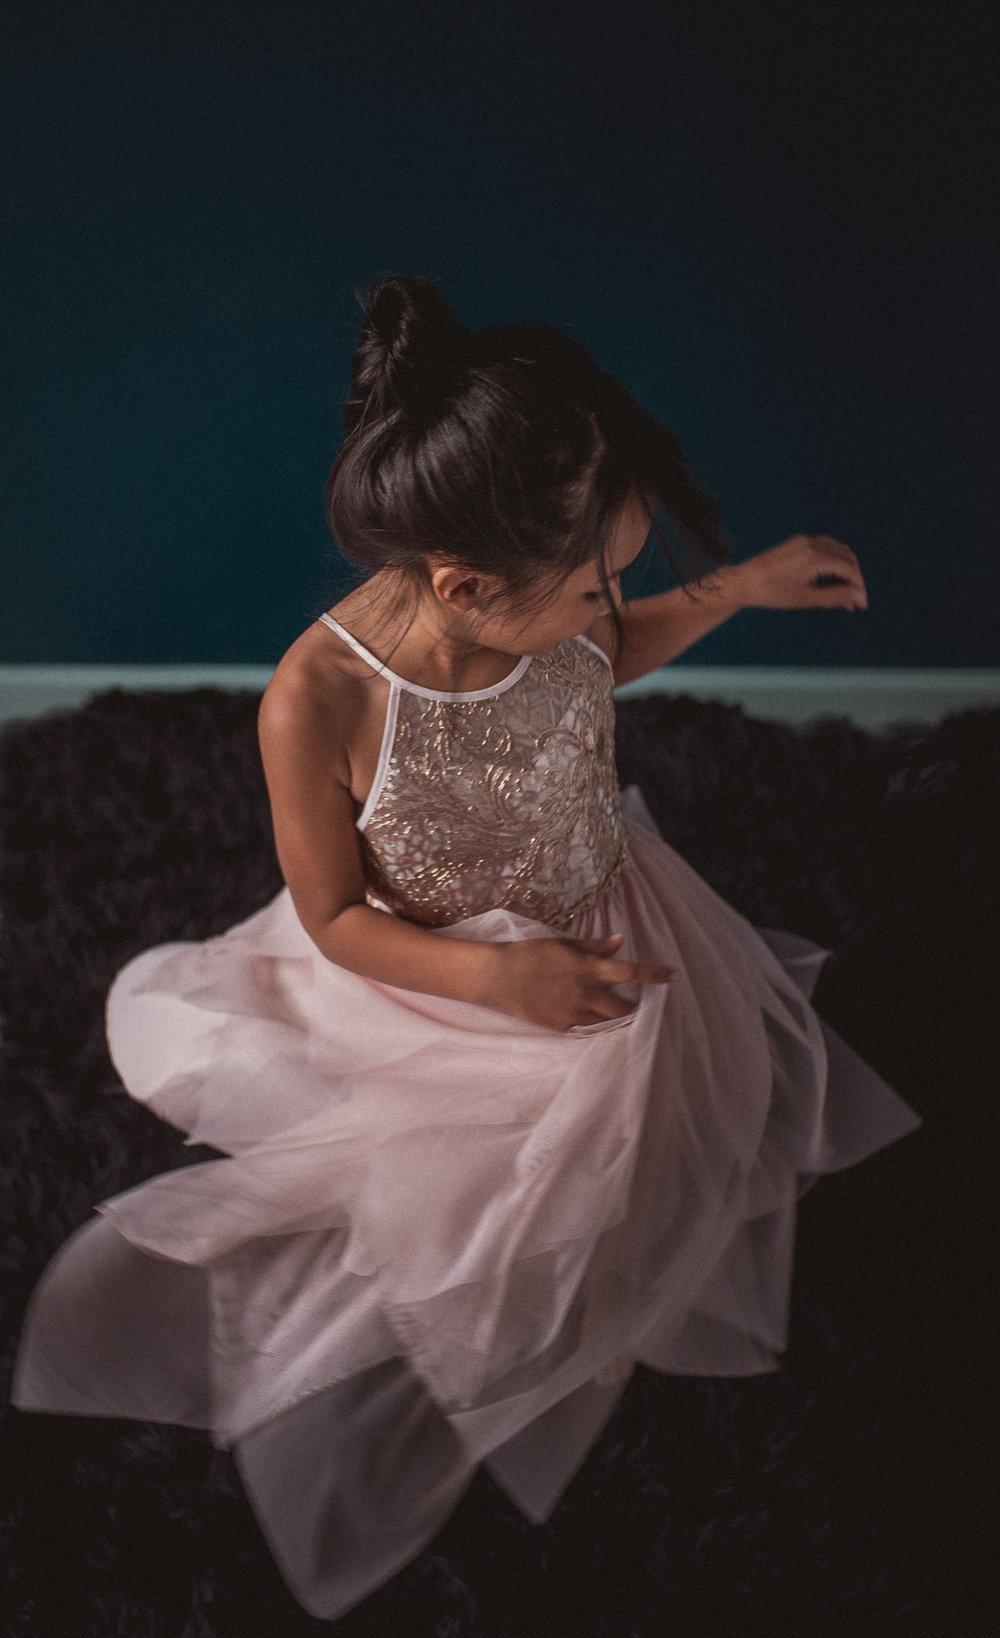 wallingford_children_portrait_photographer_1.jpg